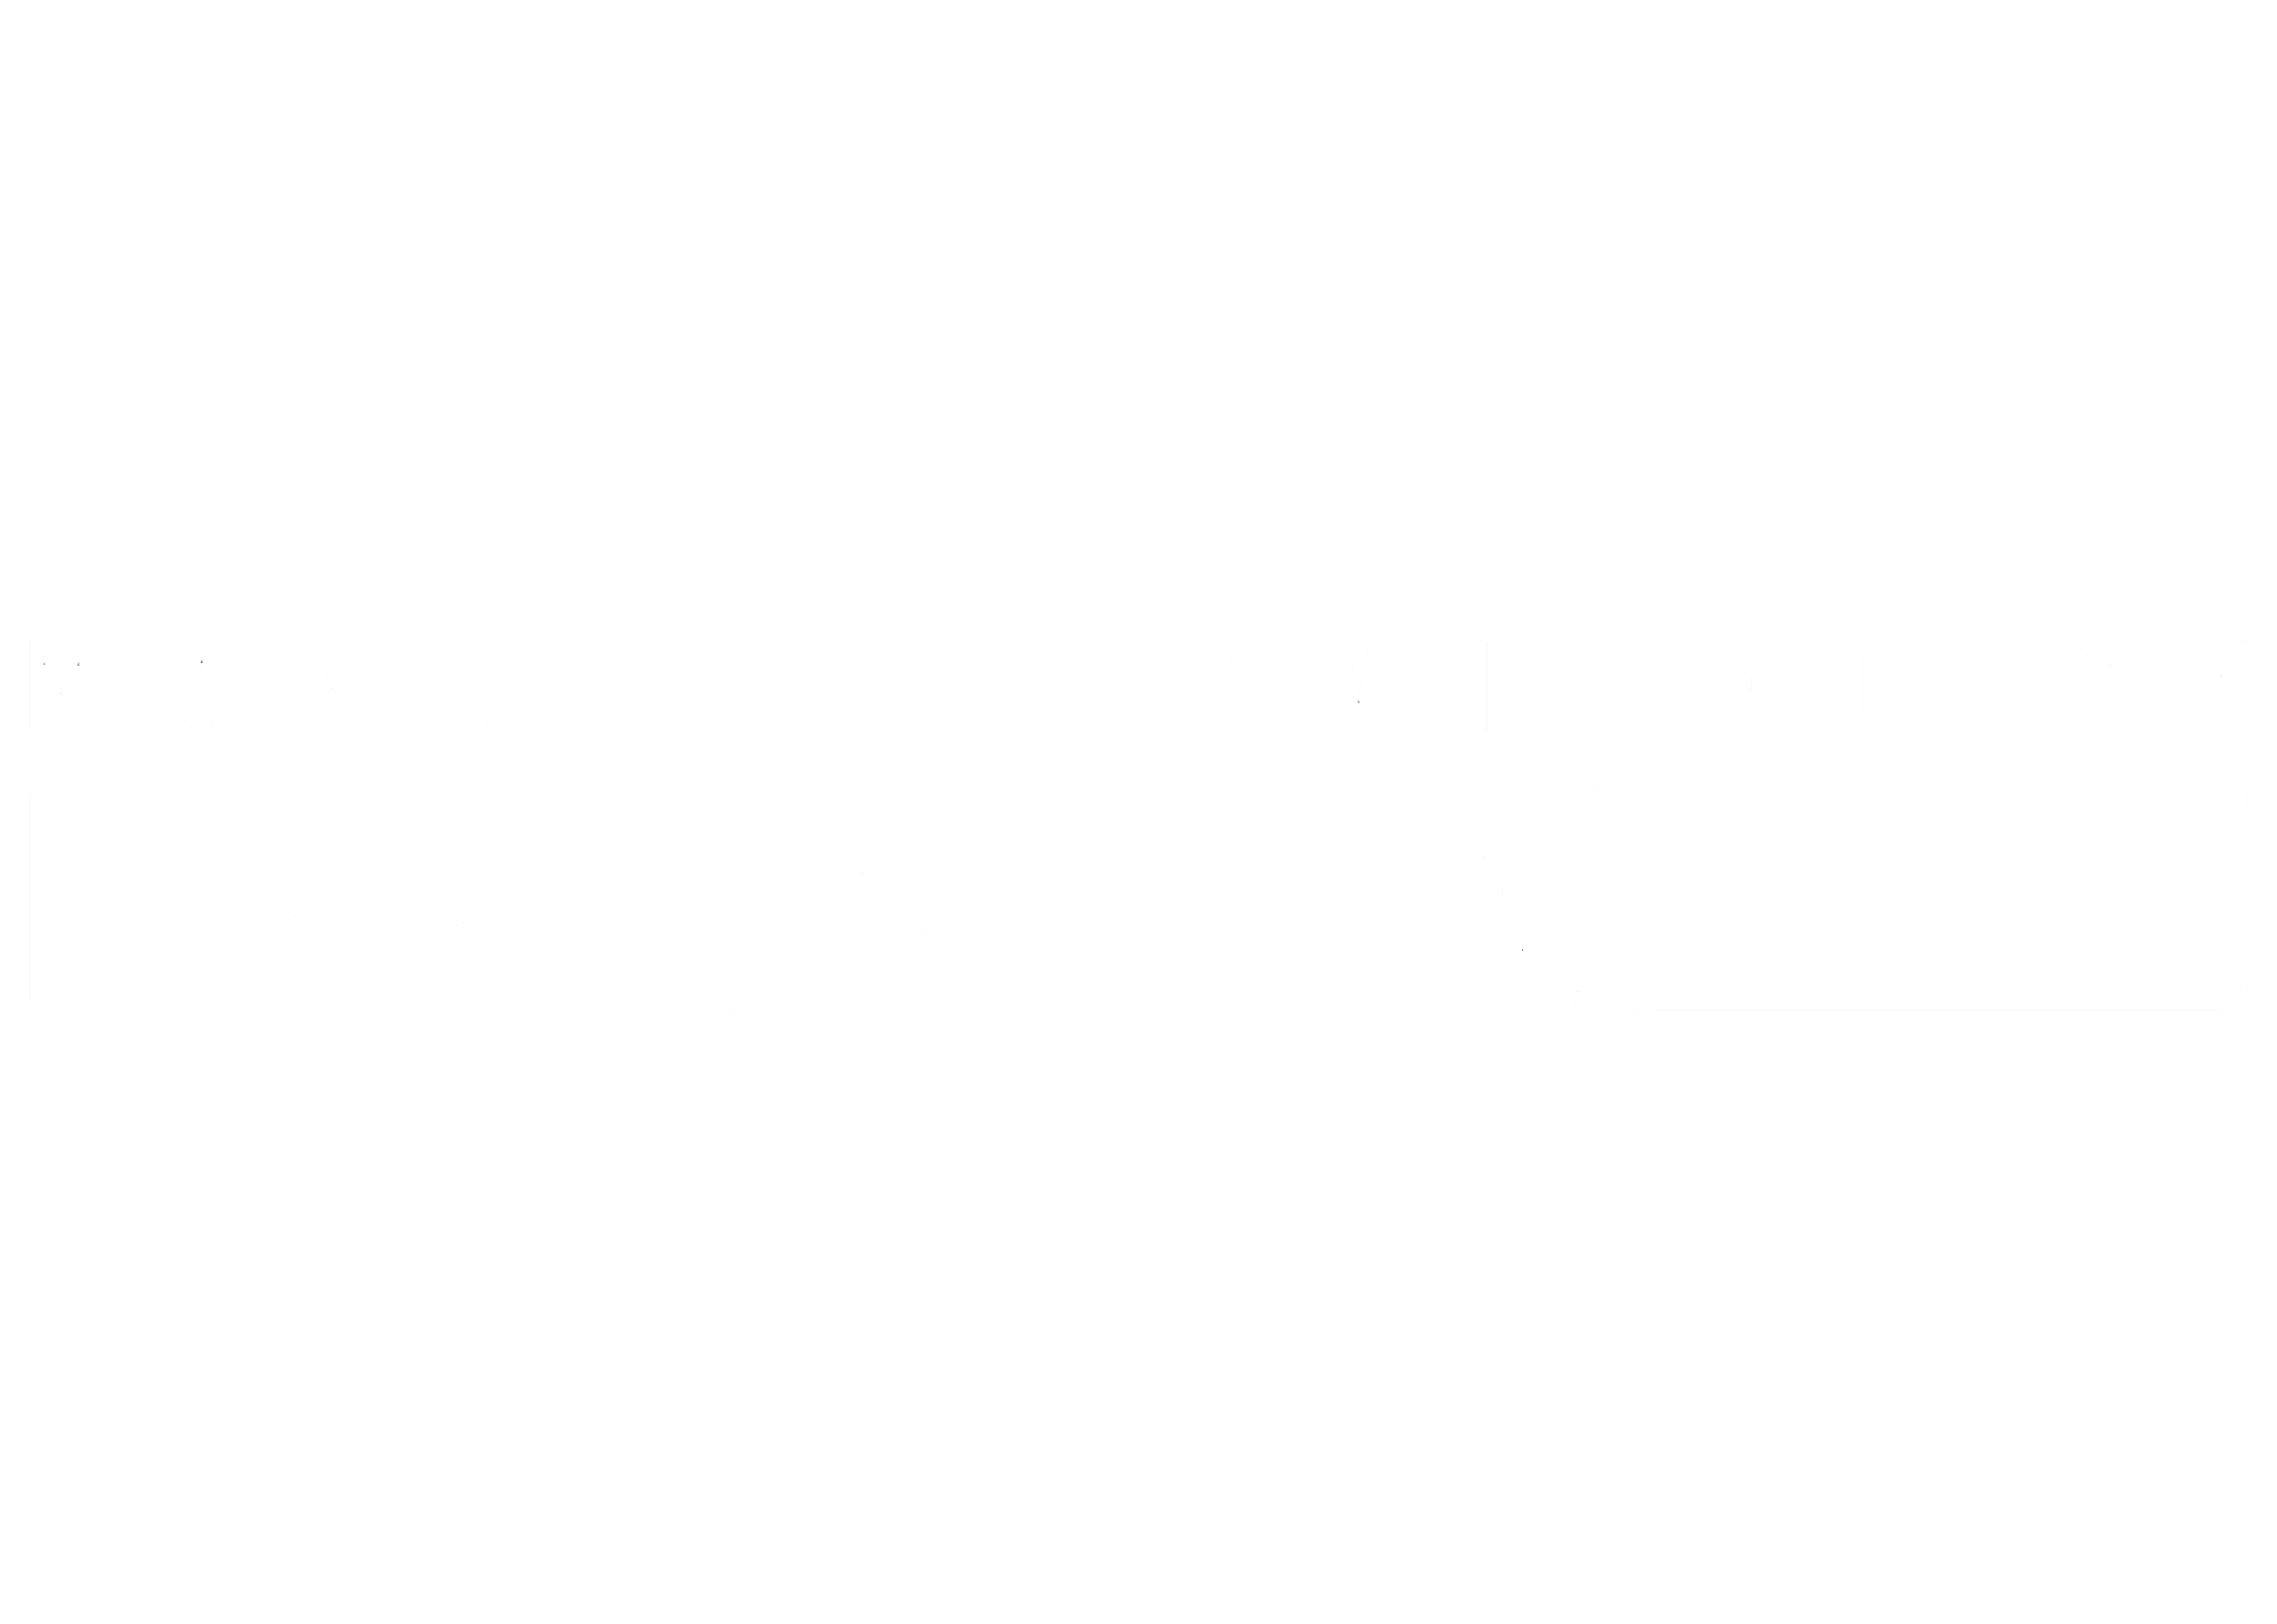 MAC_mupb(BLACK).png